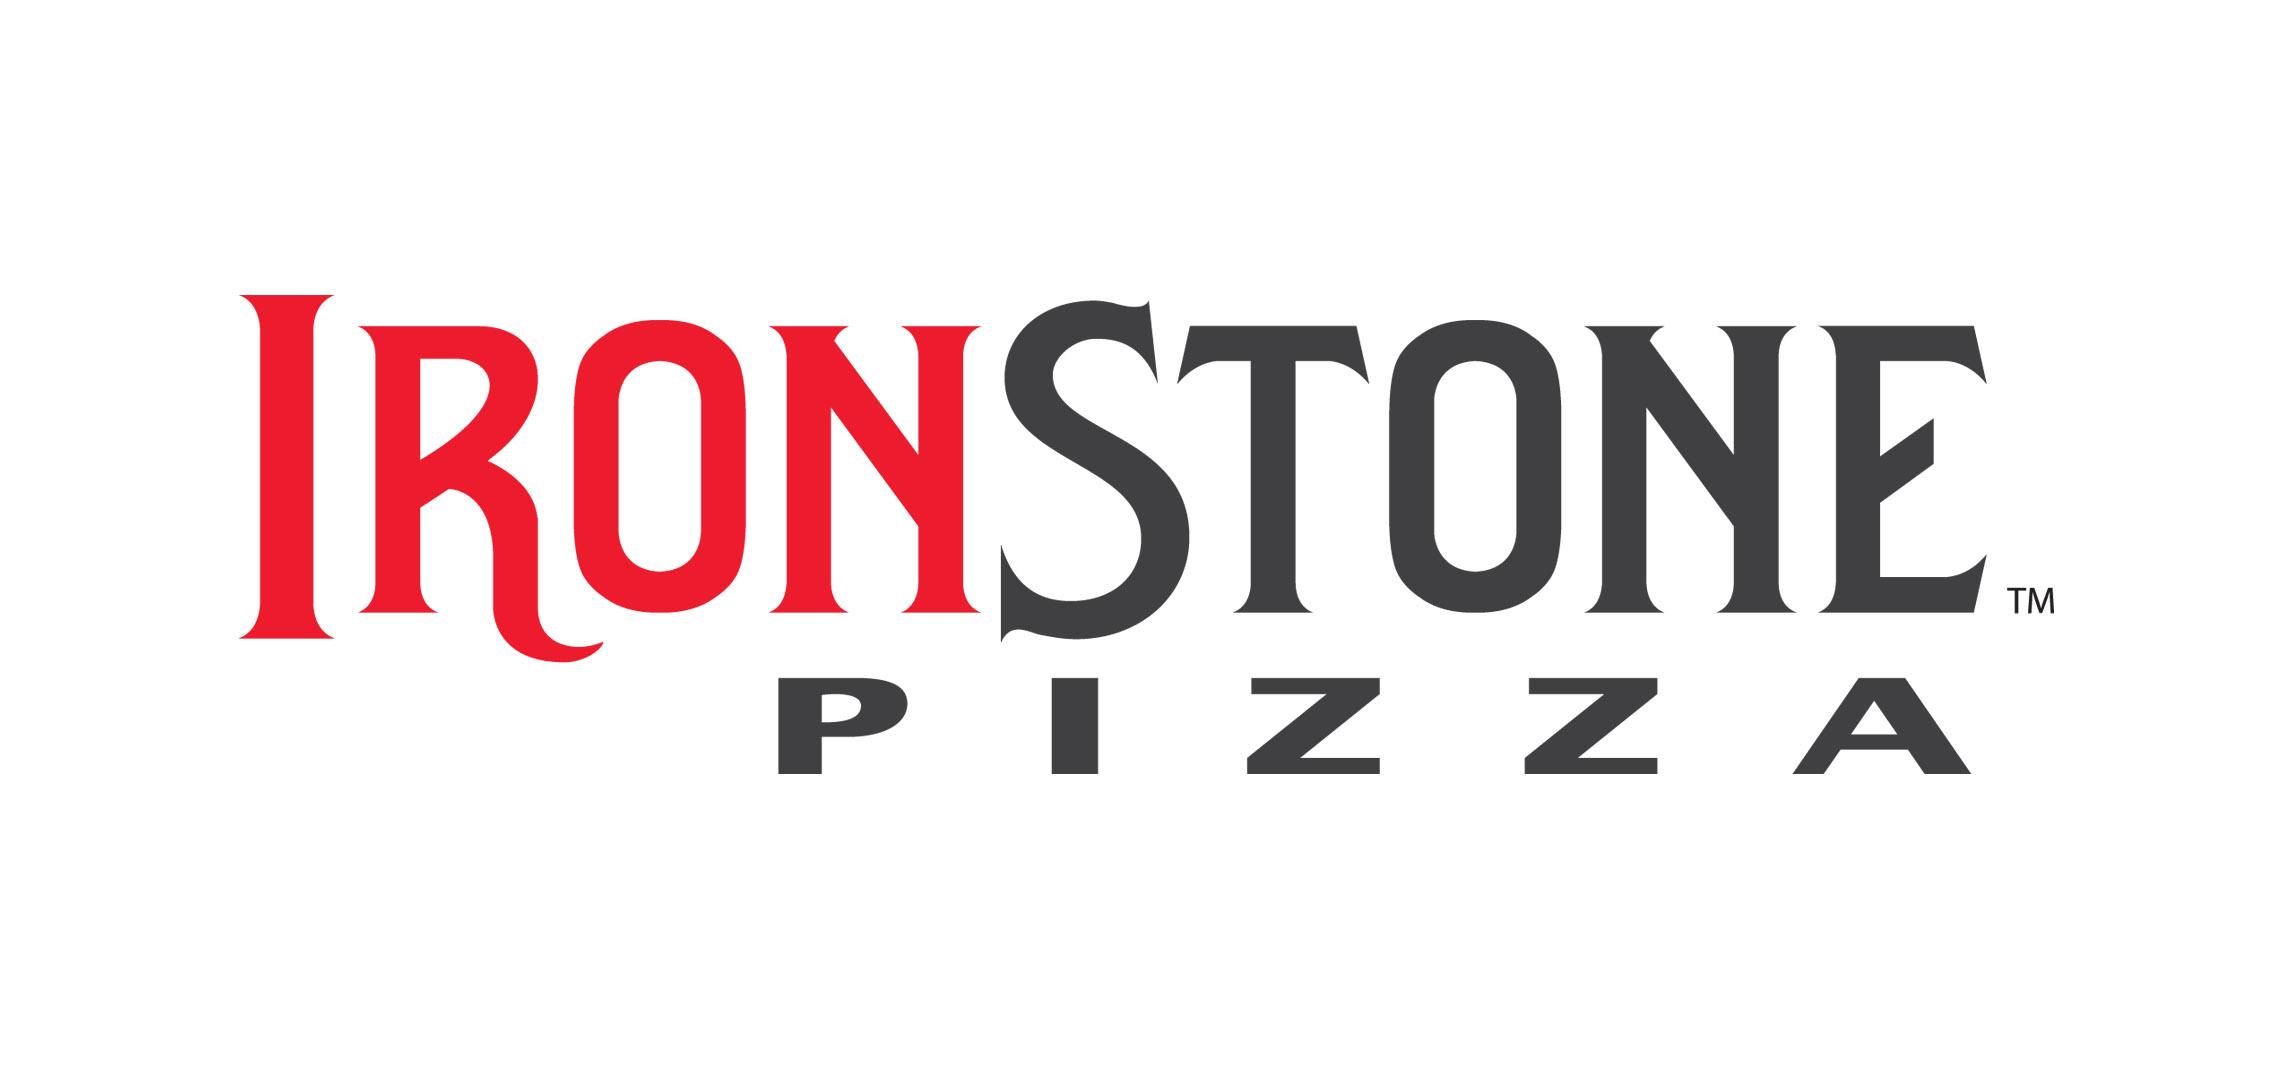 Ironstone Pizzaworks